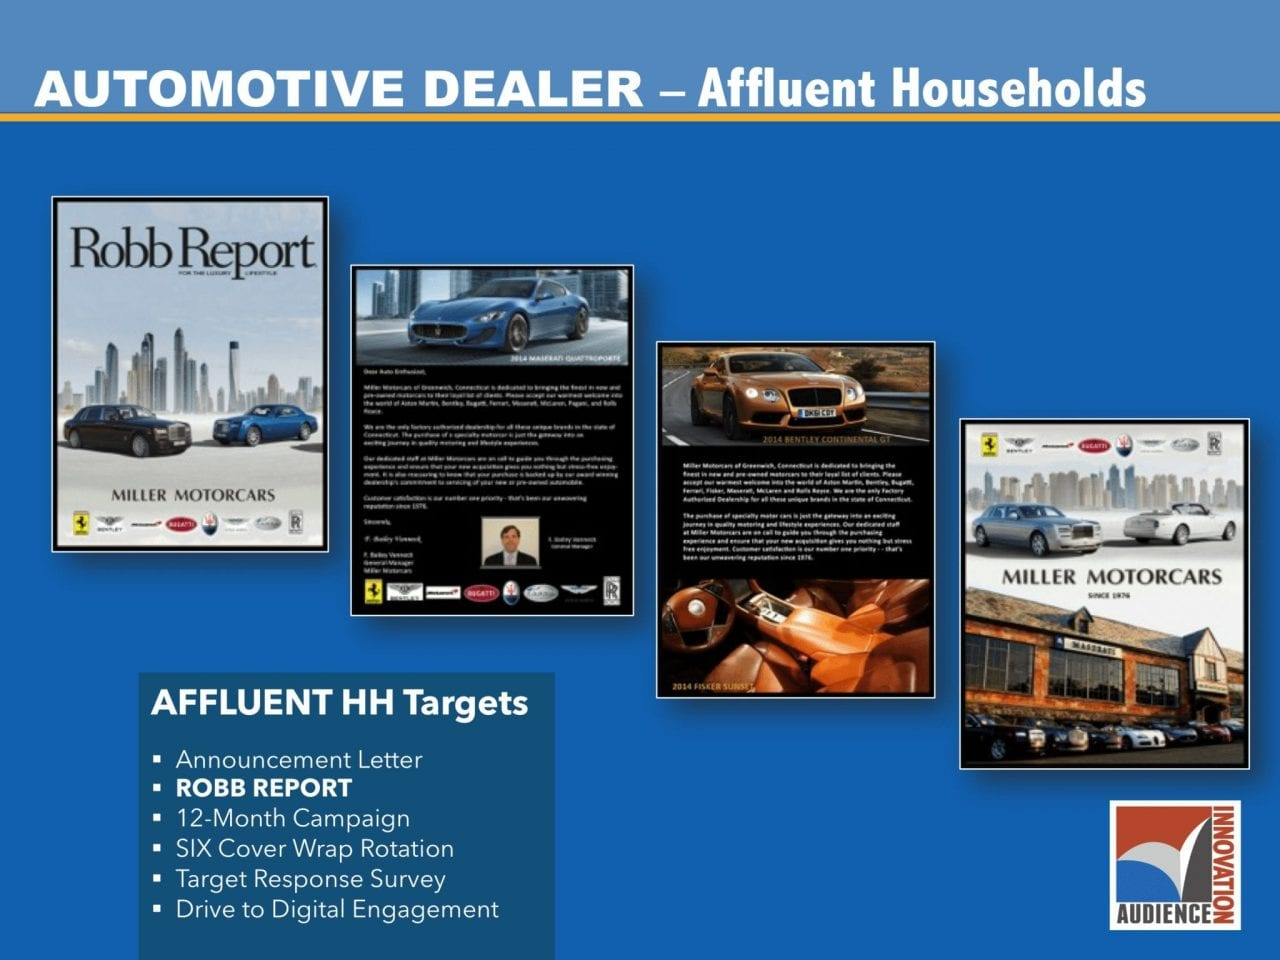 audience-innovation-magazine-cover-wrap-case-study-Slide02-1280x960.jpg